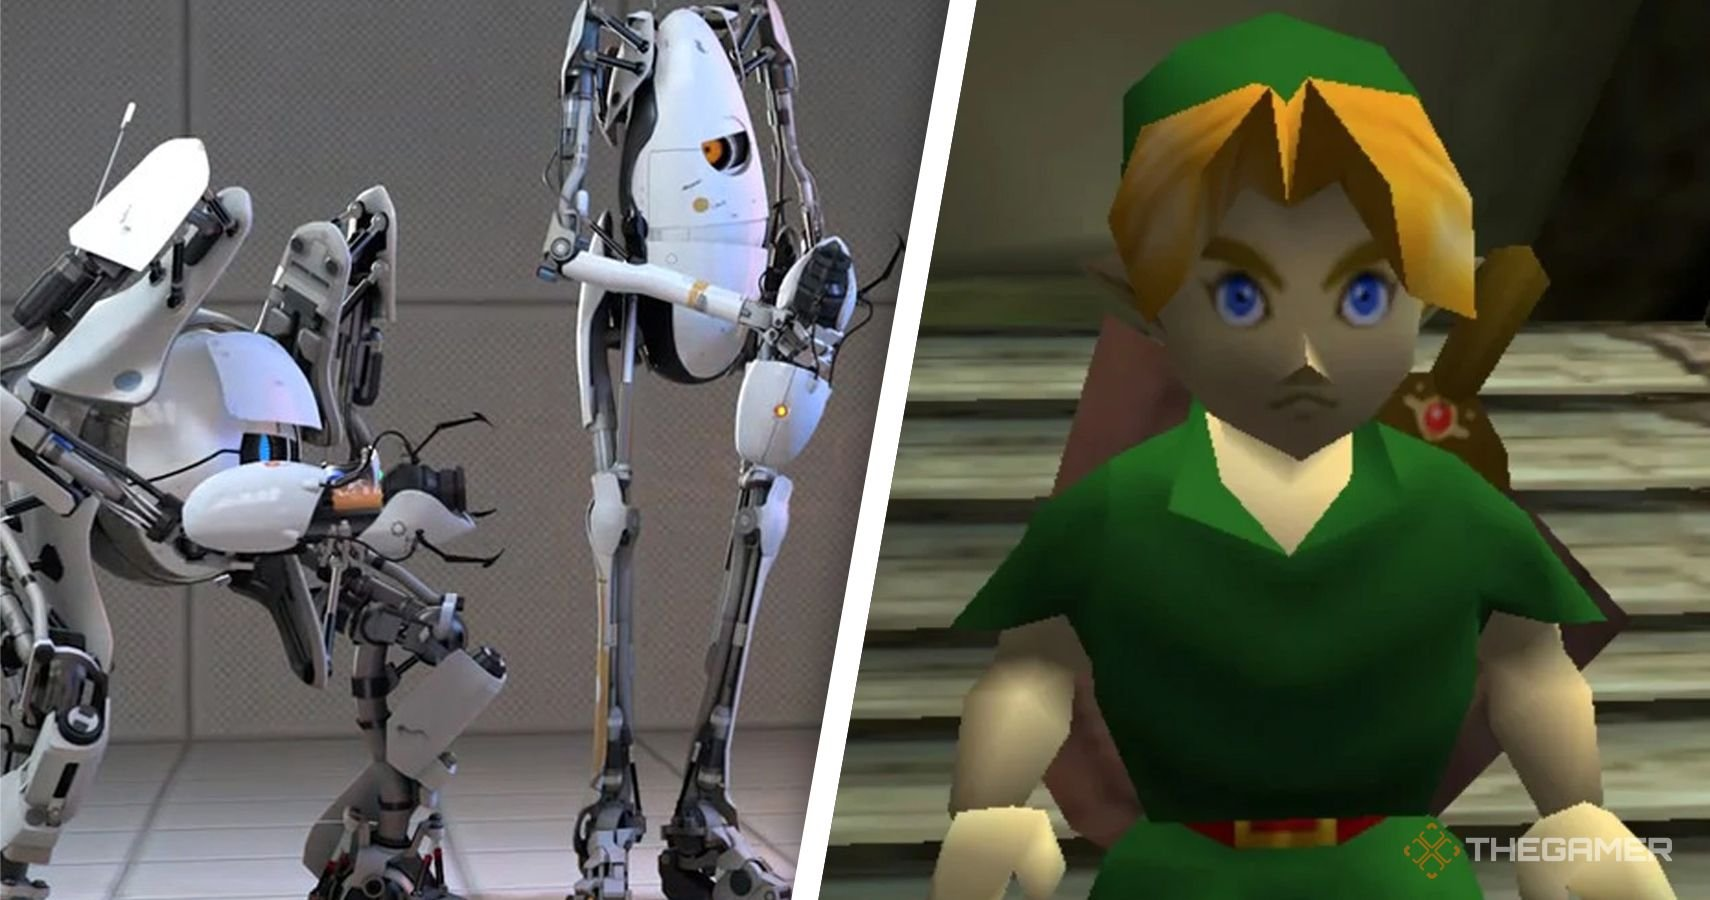 Ocarina Of Time Had A Portal Mechanic In An Early Tech Demo